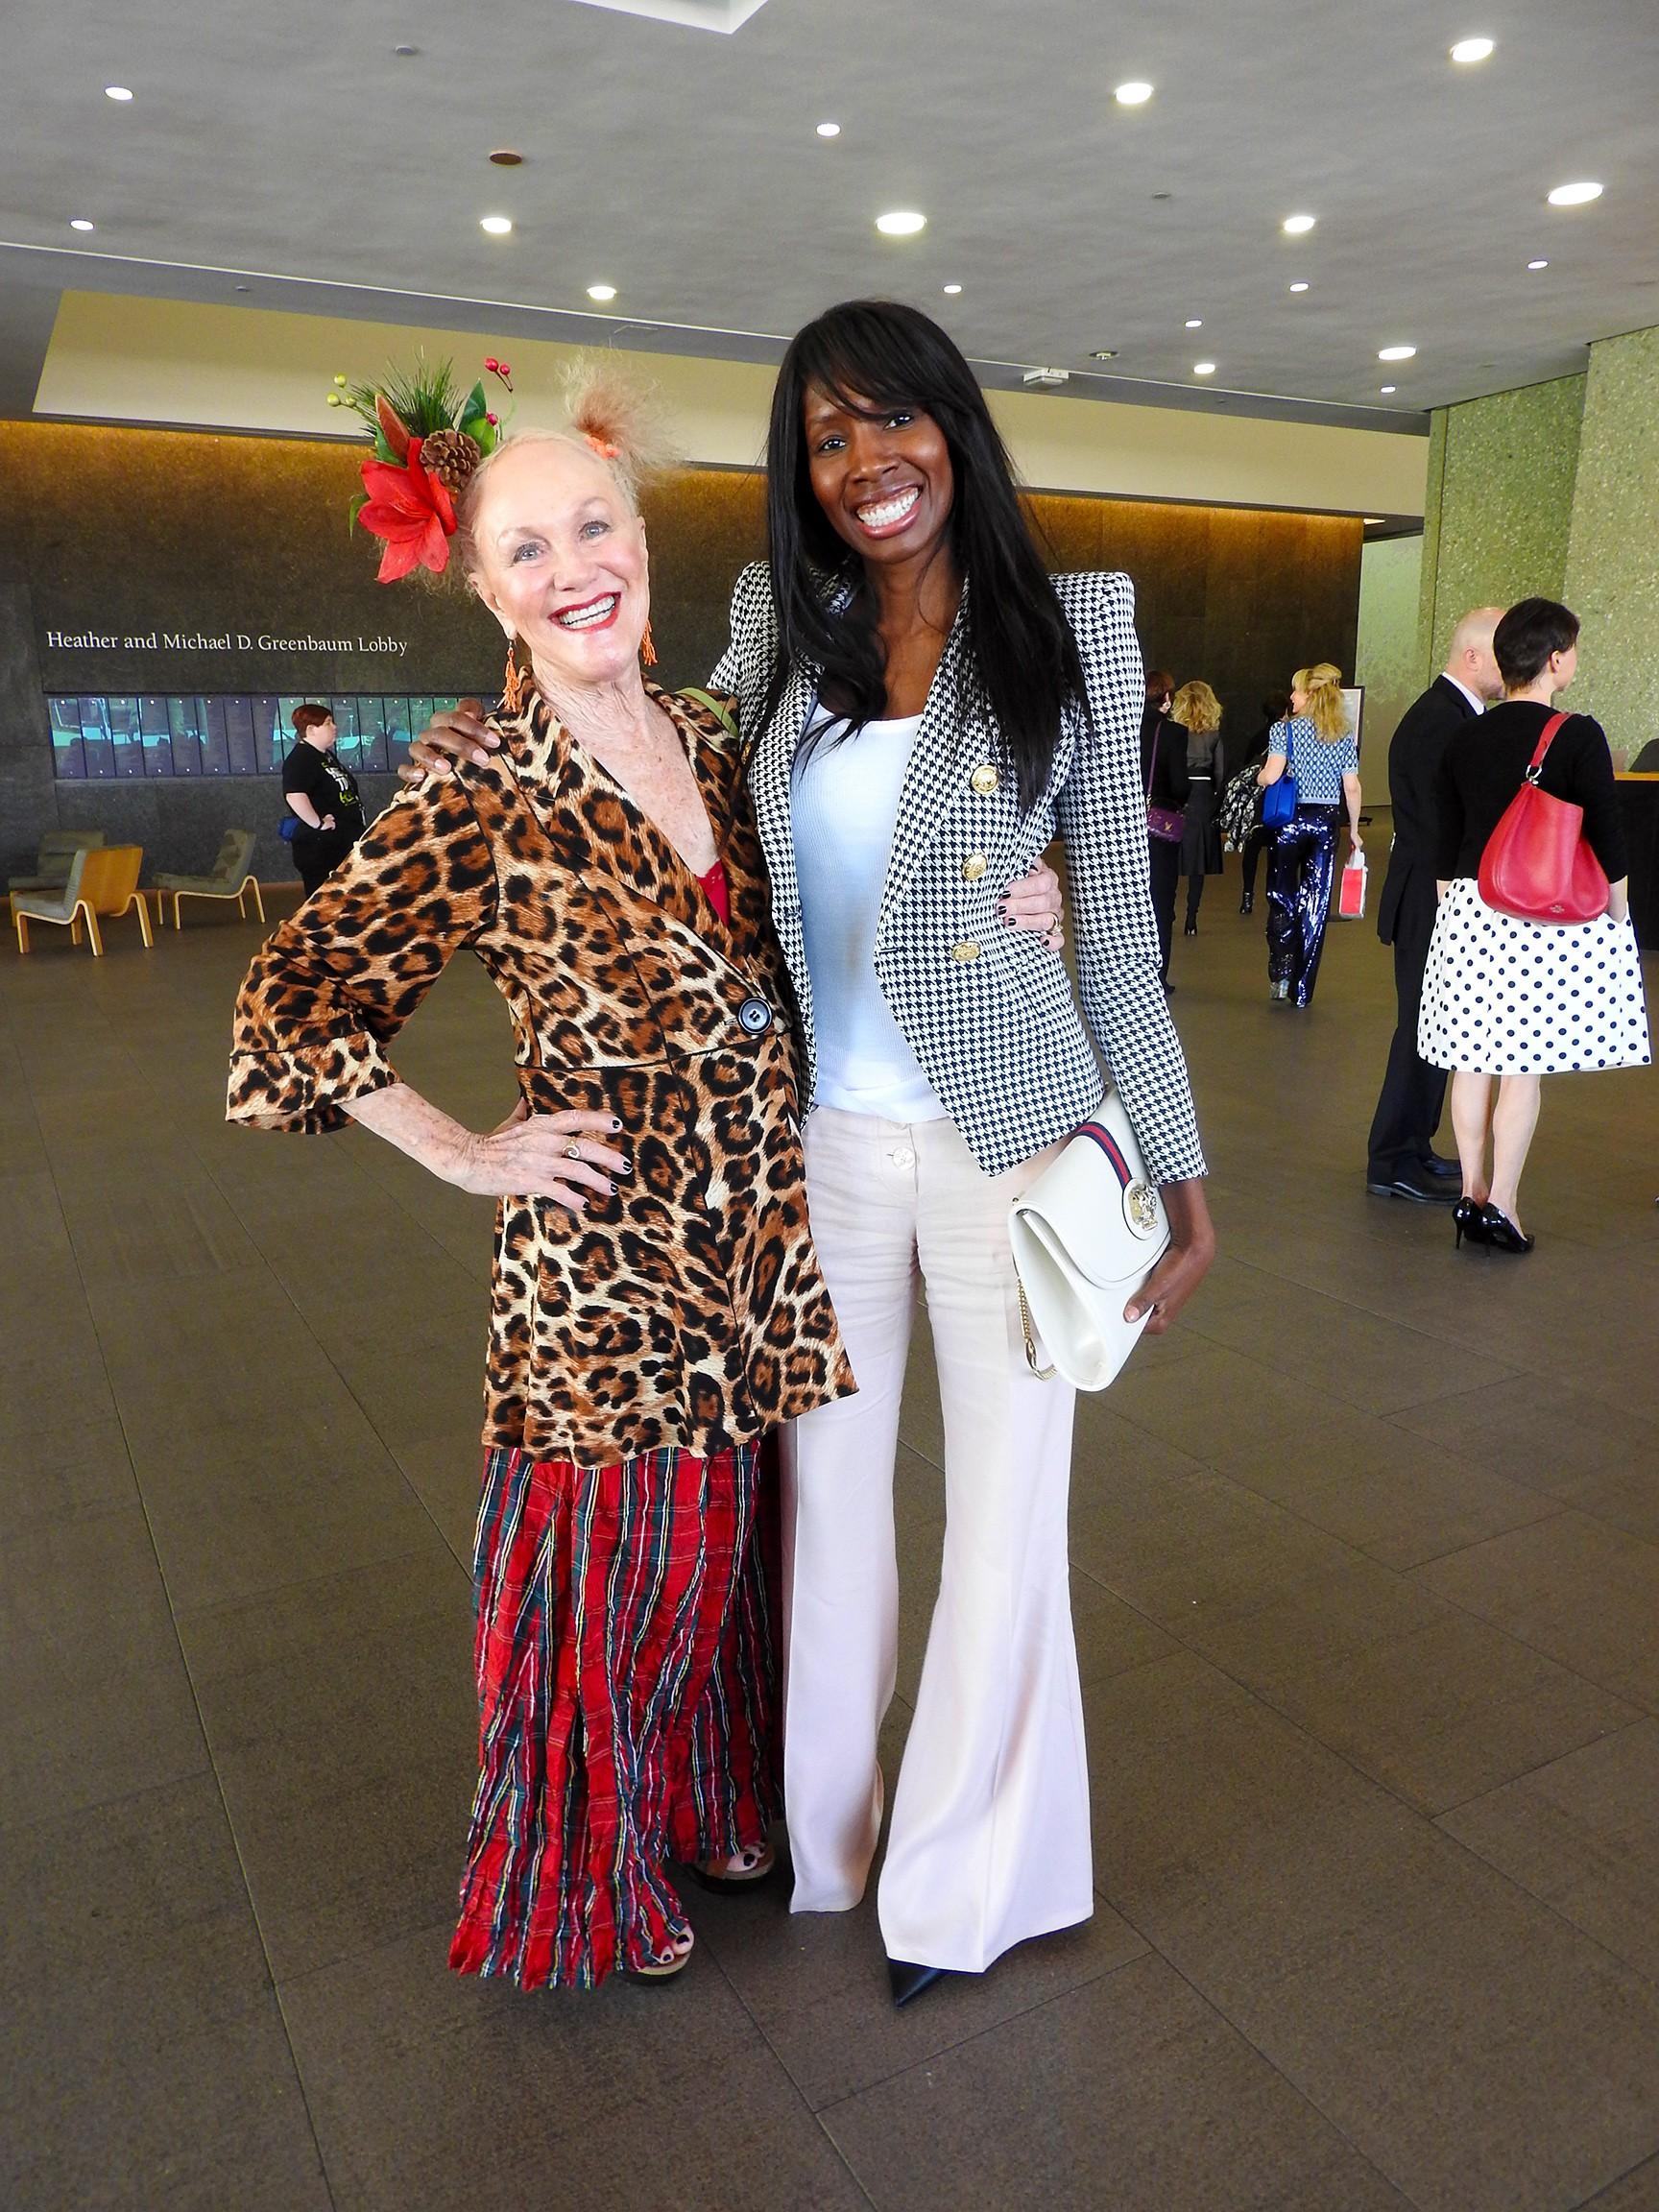 Liz Agboola and Billie Jo Herberger